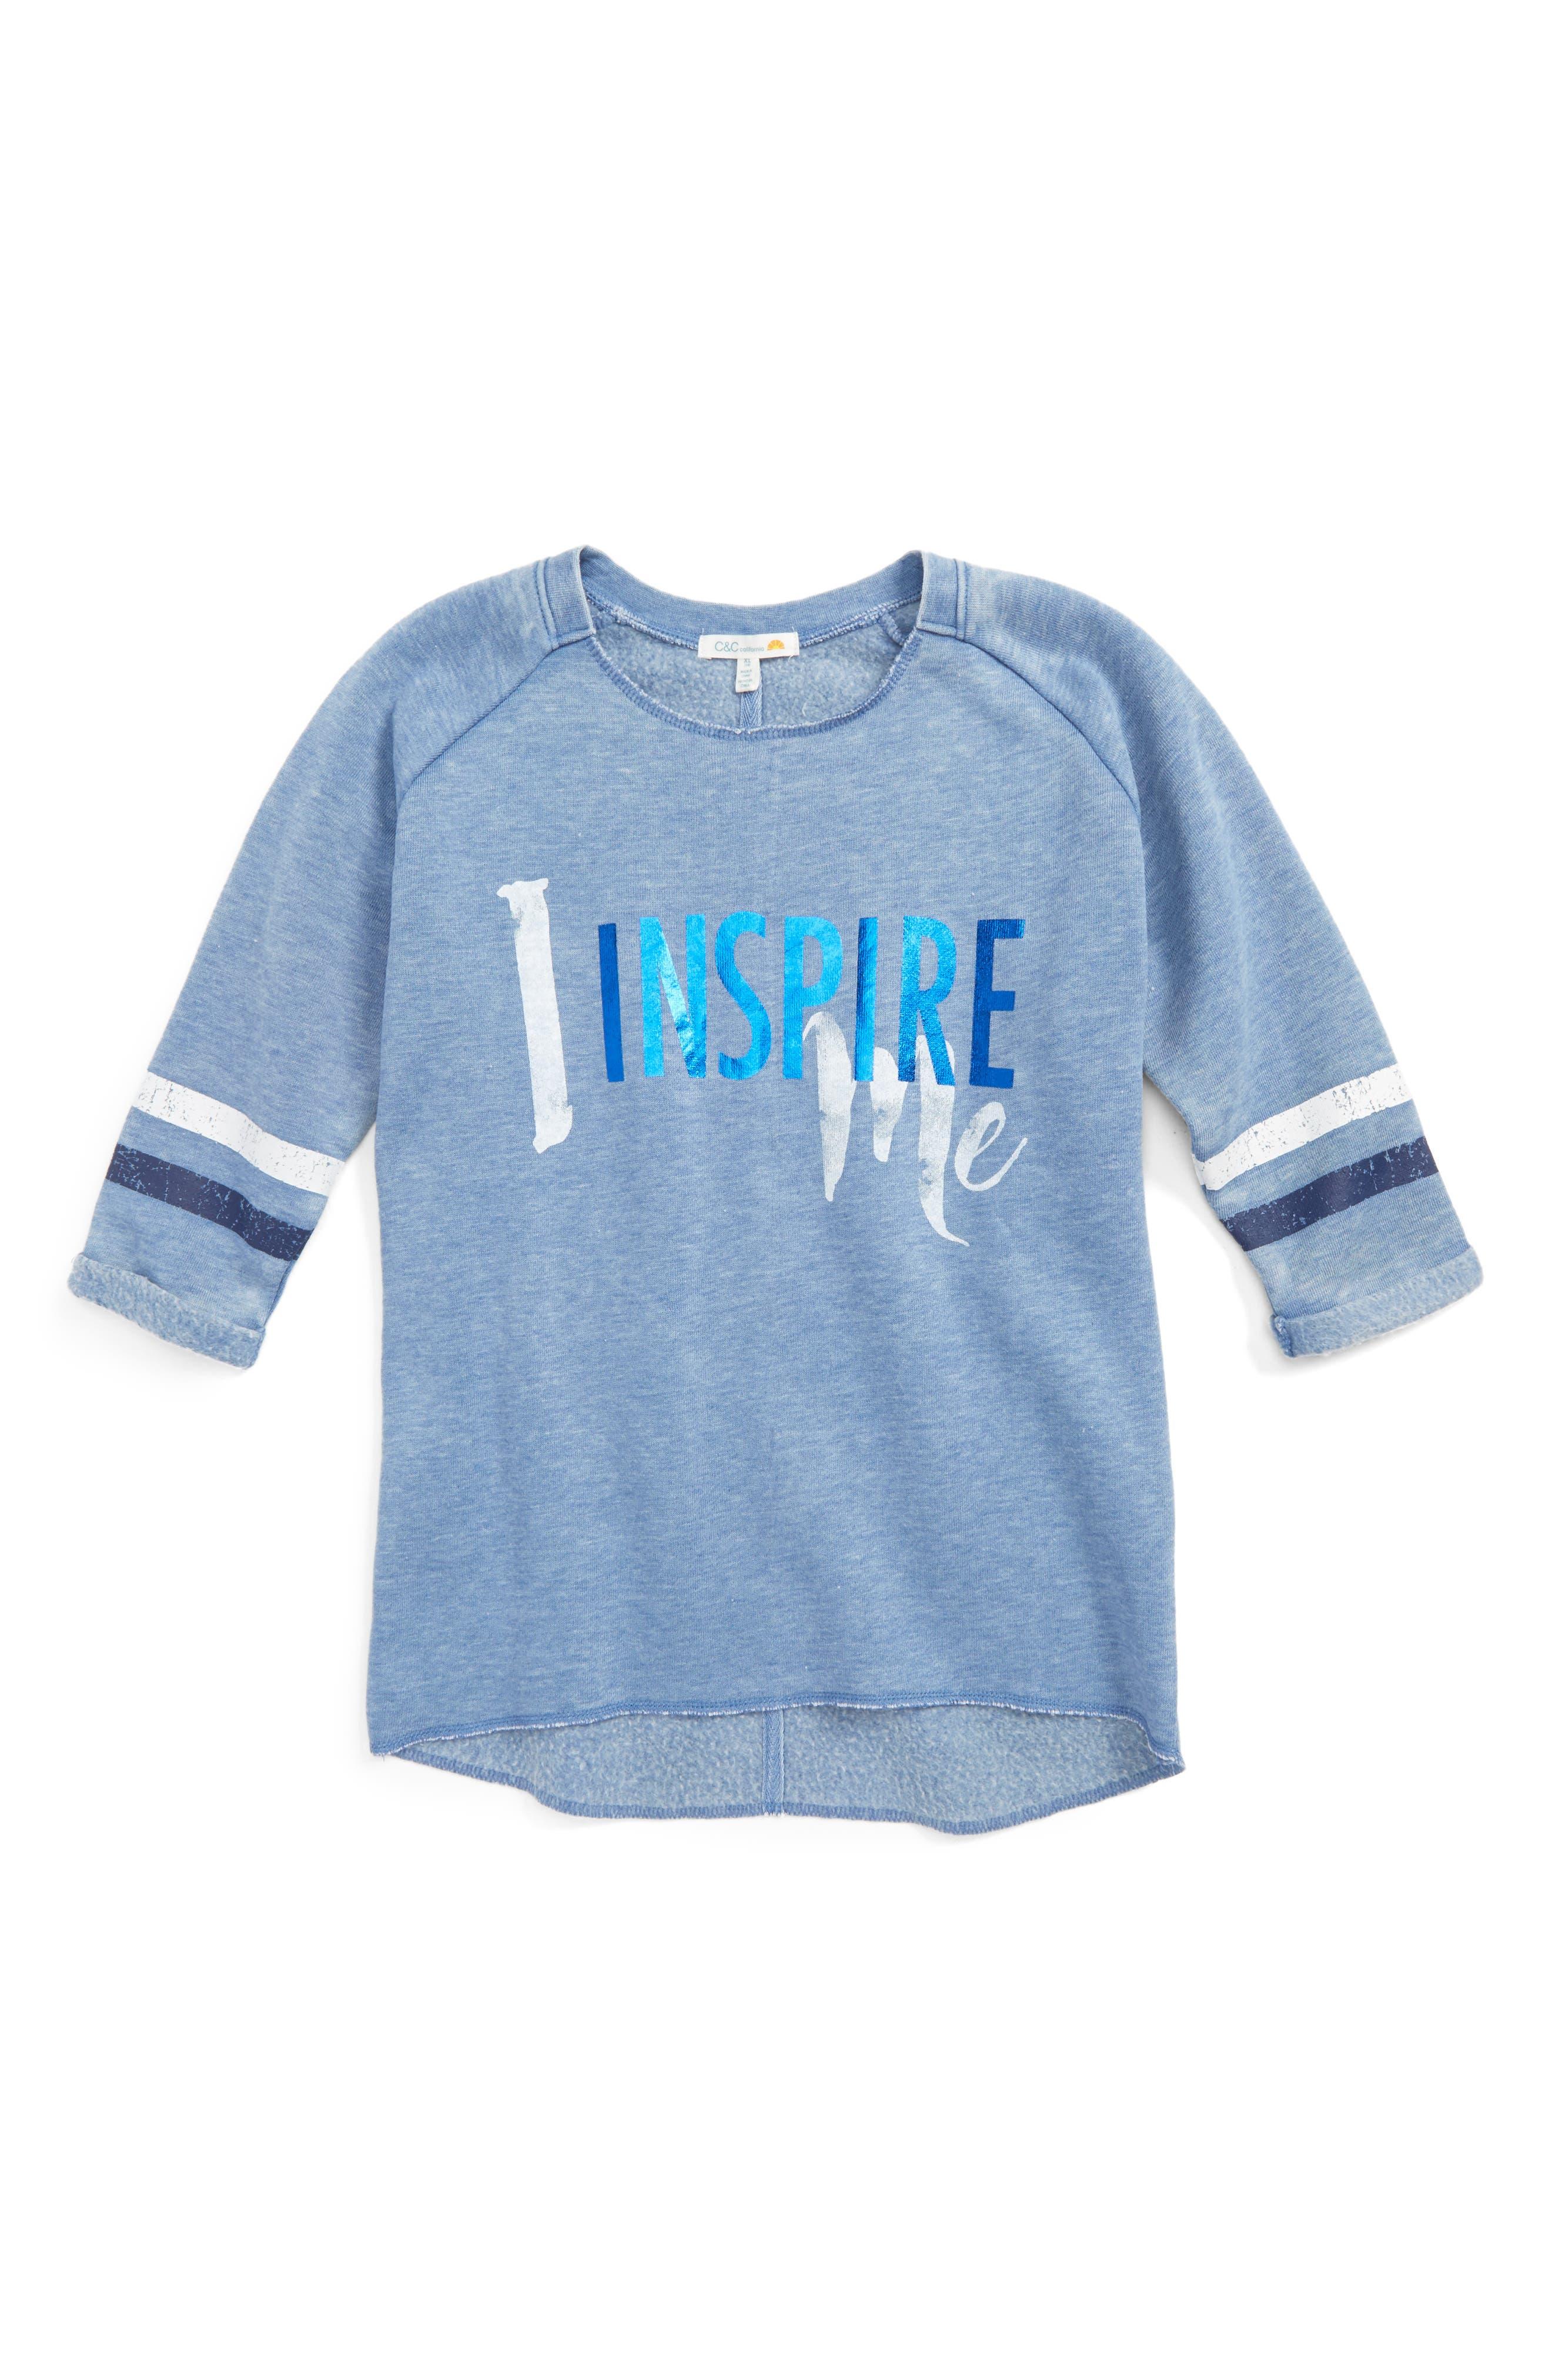 C & C California Inspire Me Sweatshirt Tee (Big Girls)